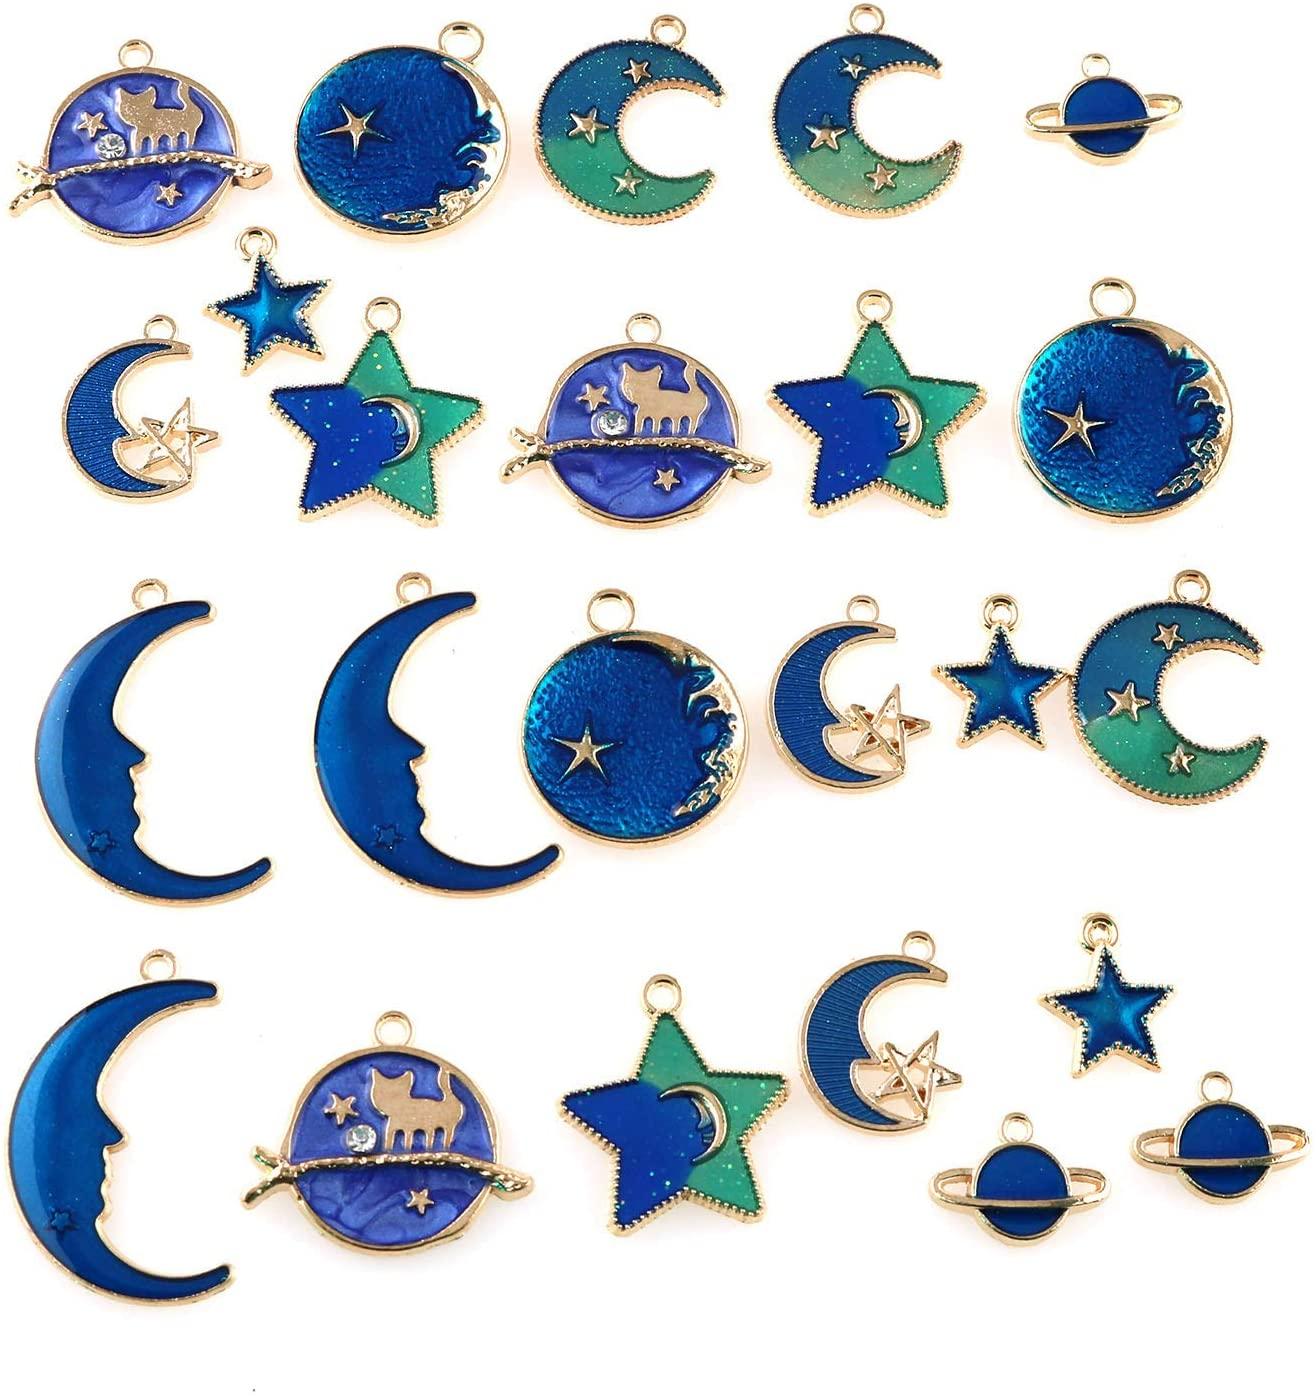 Tegg Enamel Pendant 24PCS 8 Styles Gold Plated Enamel Cat Moon Star Celestial Earth Charm Pendants for DIY Jewelry Making